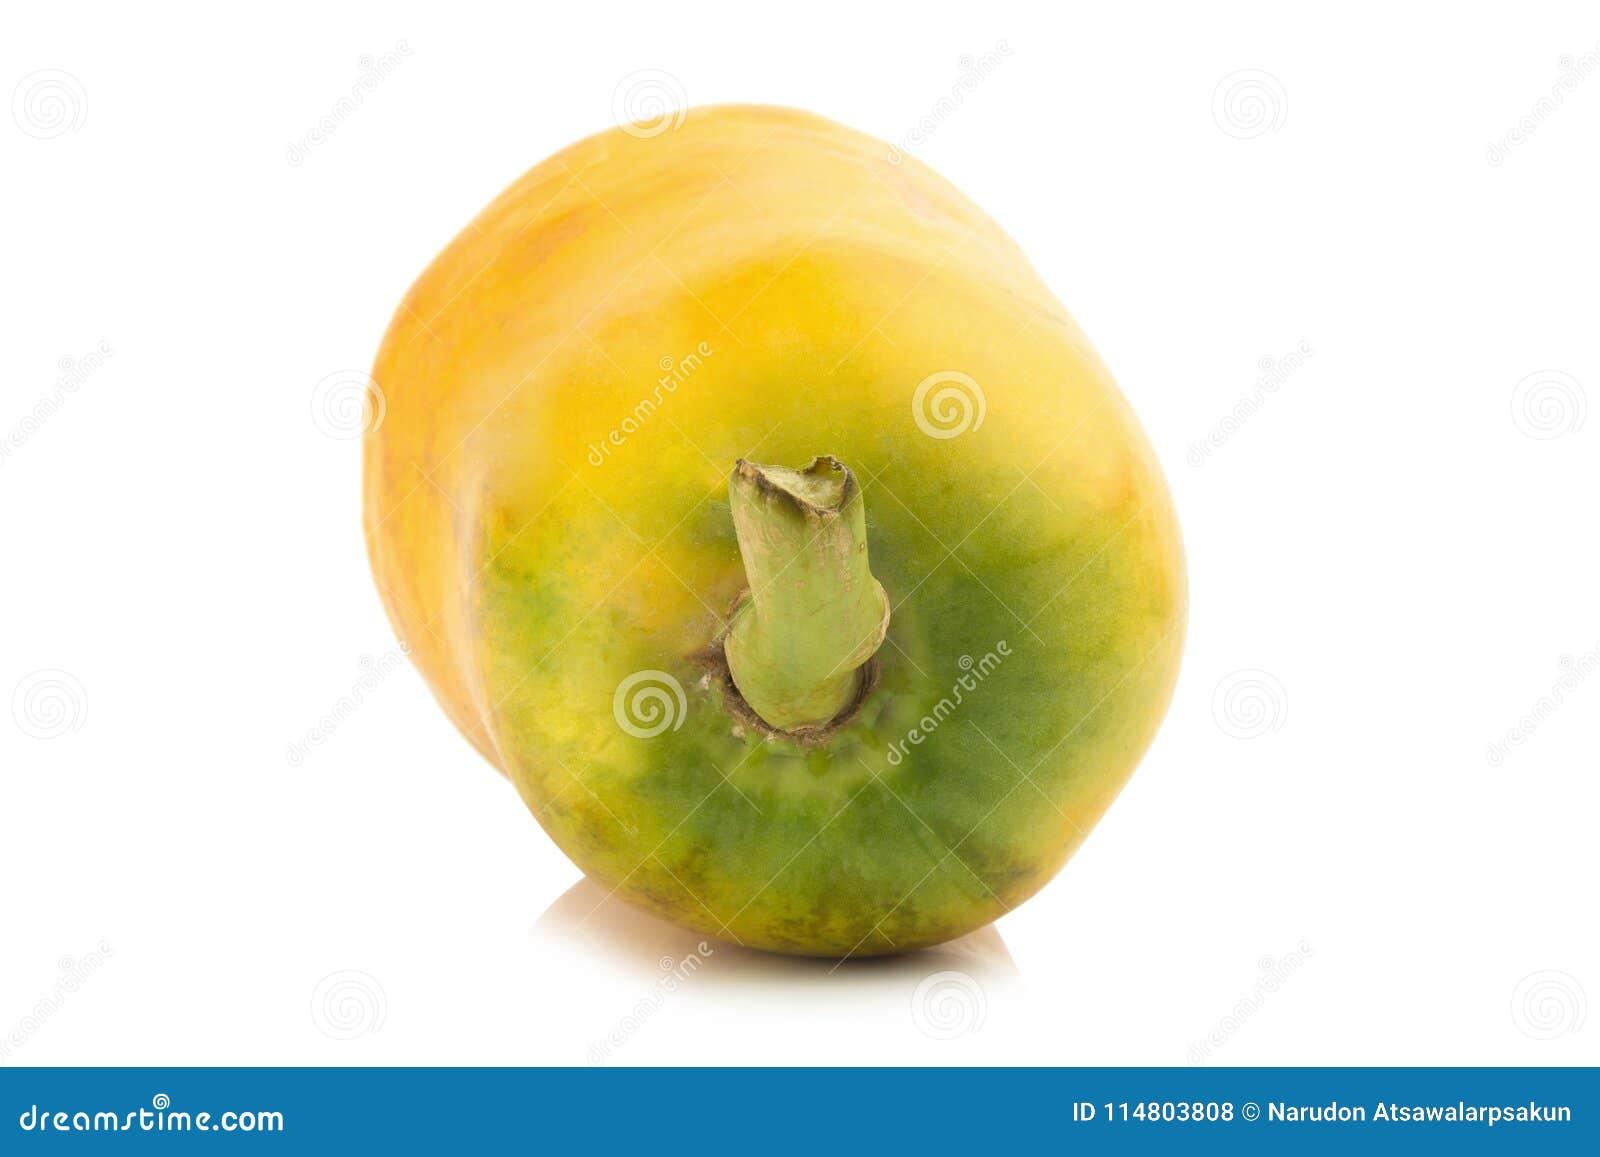 papaya fruit. closeup rear part. color orange. asian. isolated